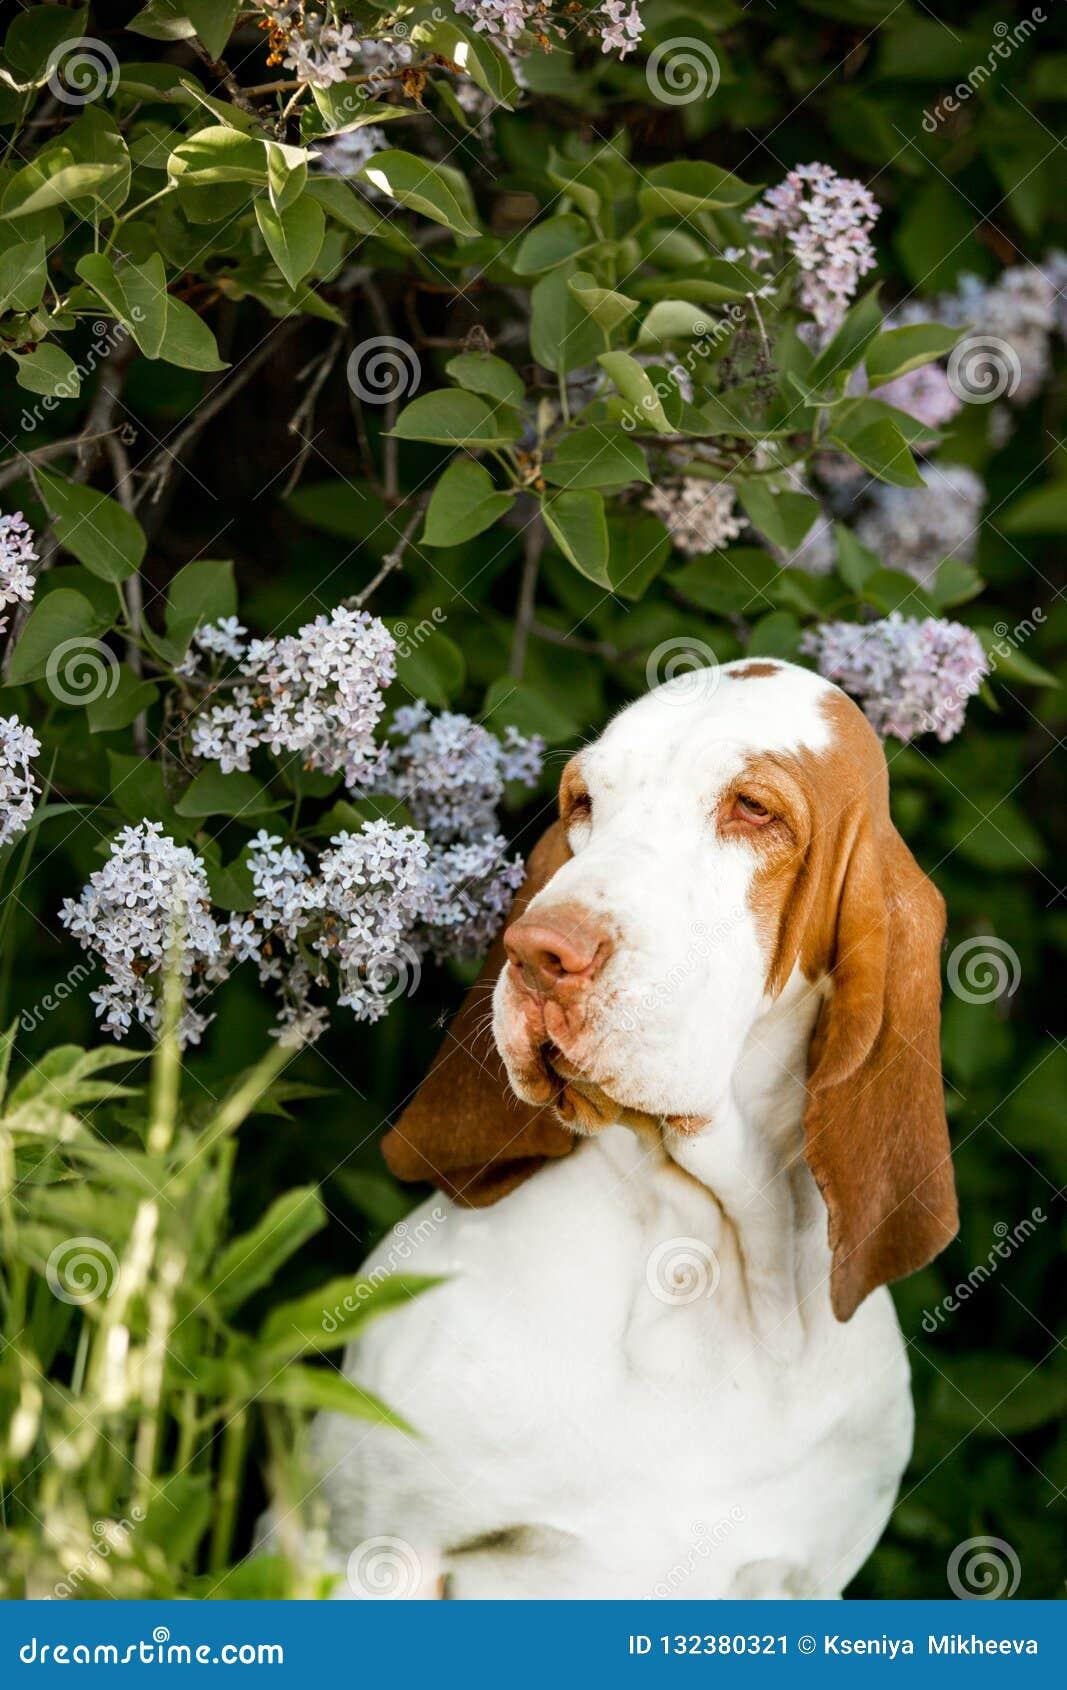 smiling Basset hound dog standingin flowers. green background